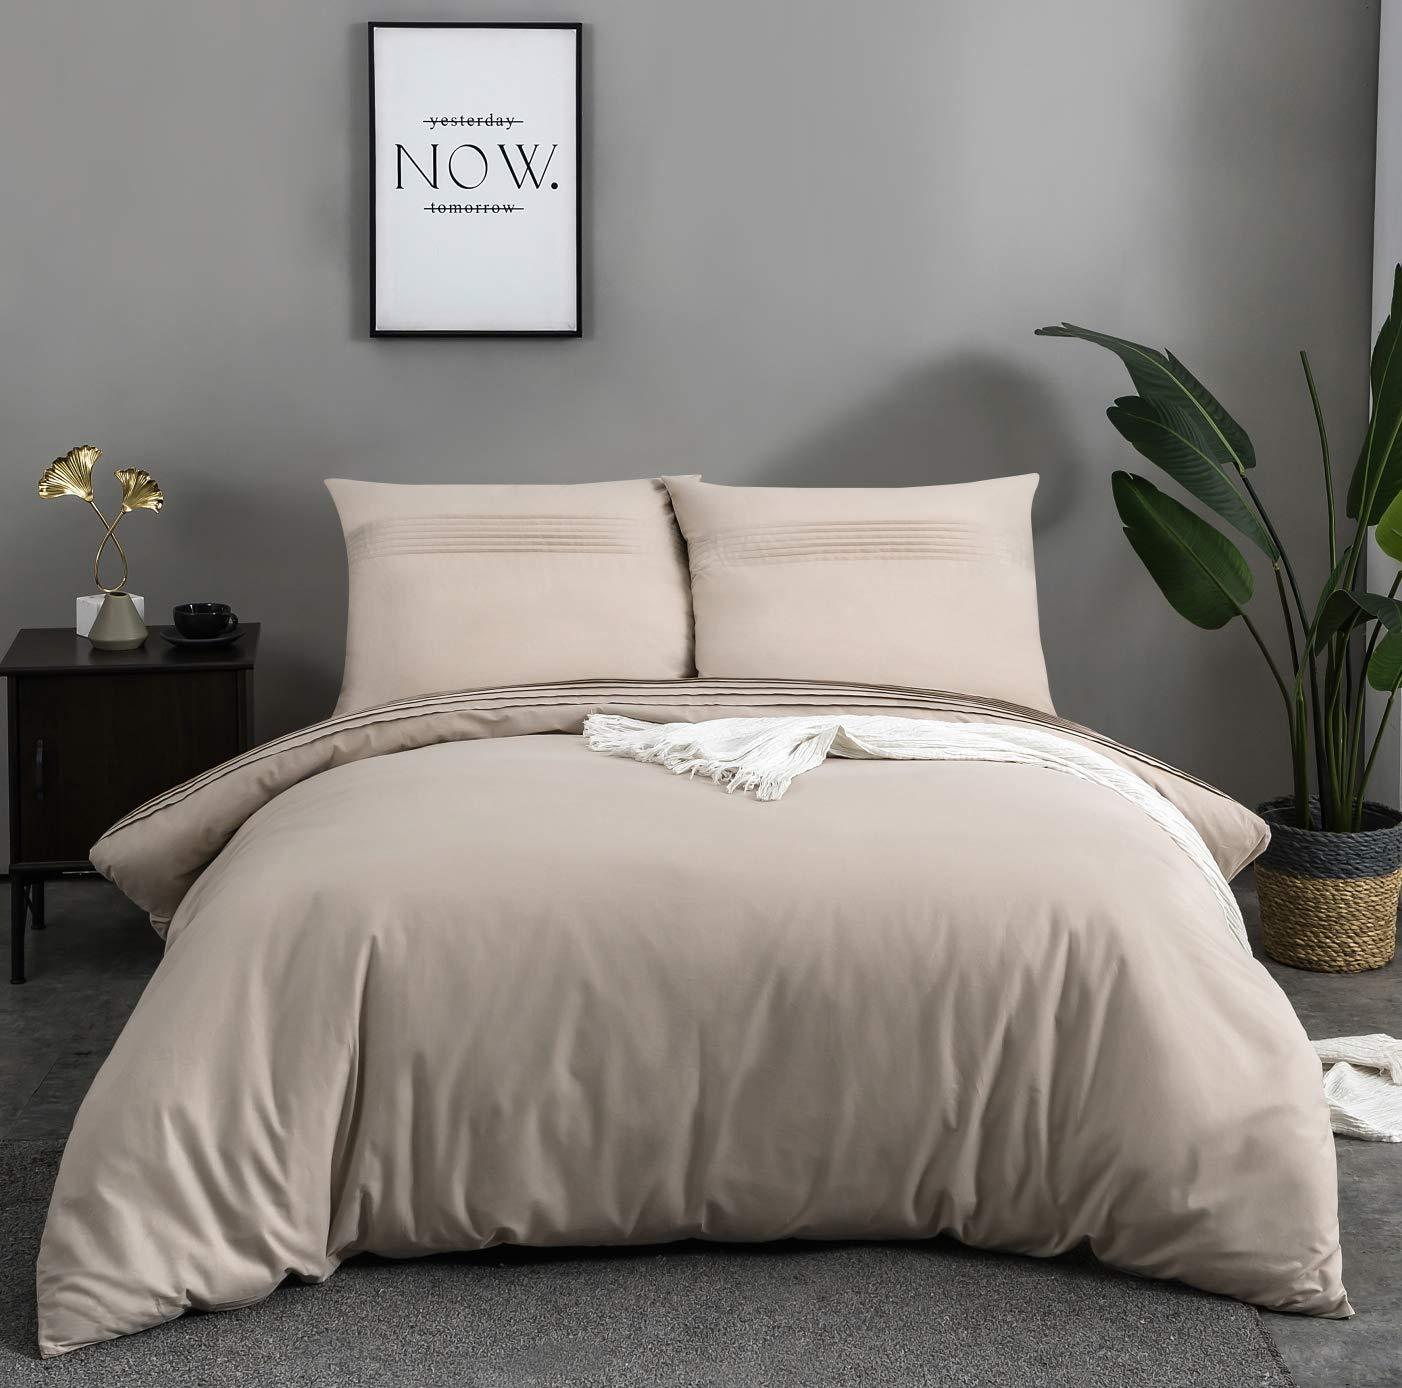 QZYI - Funda de edredón de 400 hilos/cm2, 100 % algodón, juego de cama de 220 x 240 cm de alta gama con 2 fundas de almohada de 65 x 65 cm con cremallera: Amazon.es: Hogar